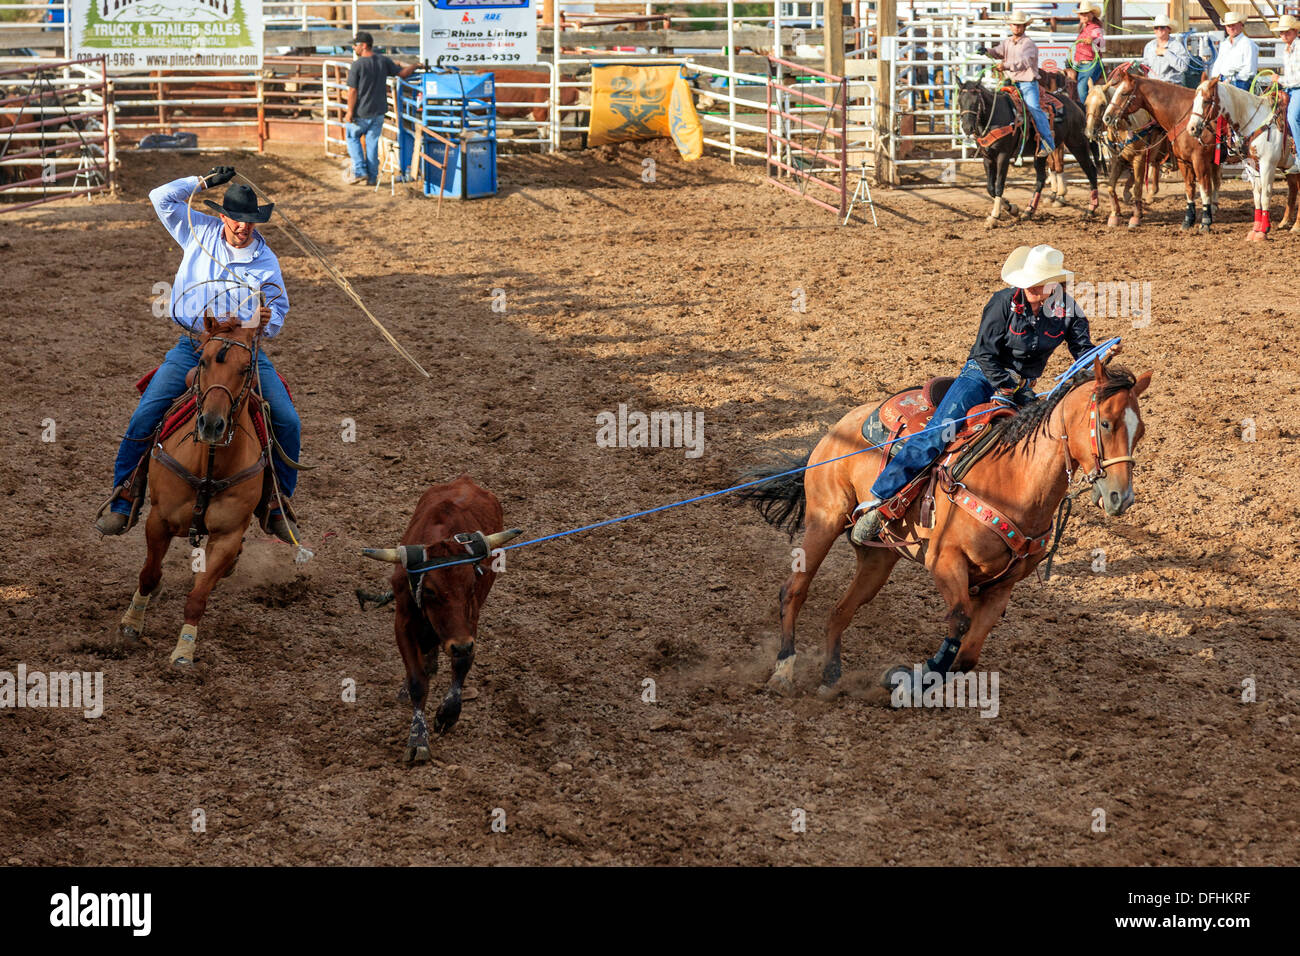 Cowboy Roping While Riding Stock Photos Amp Cowboy Roping